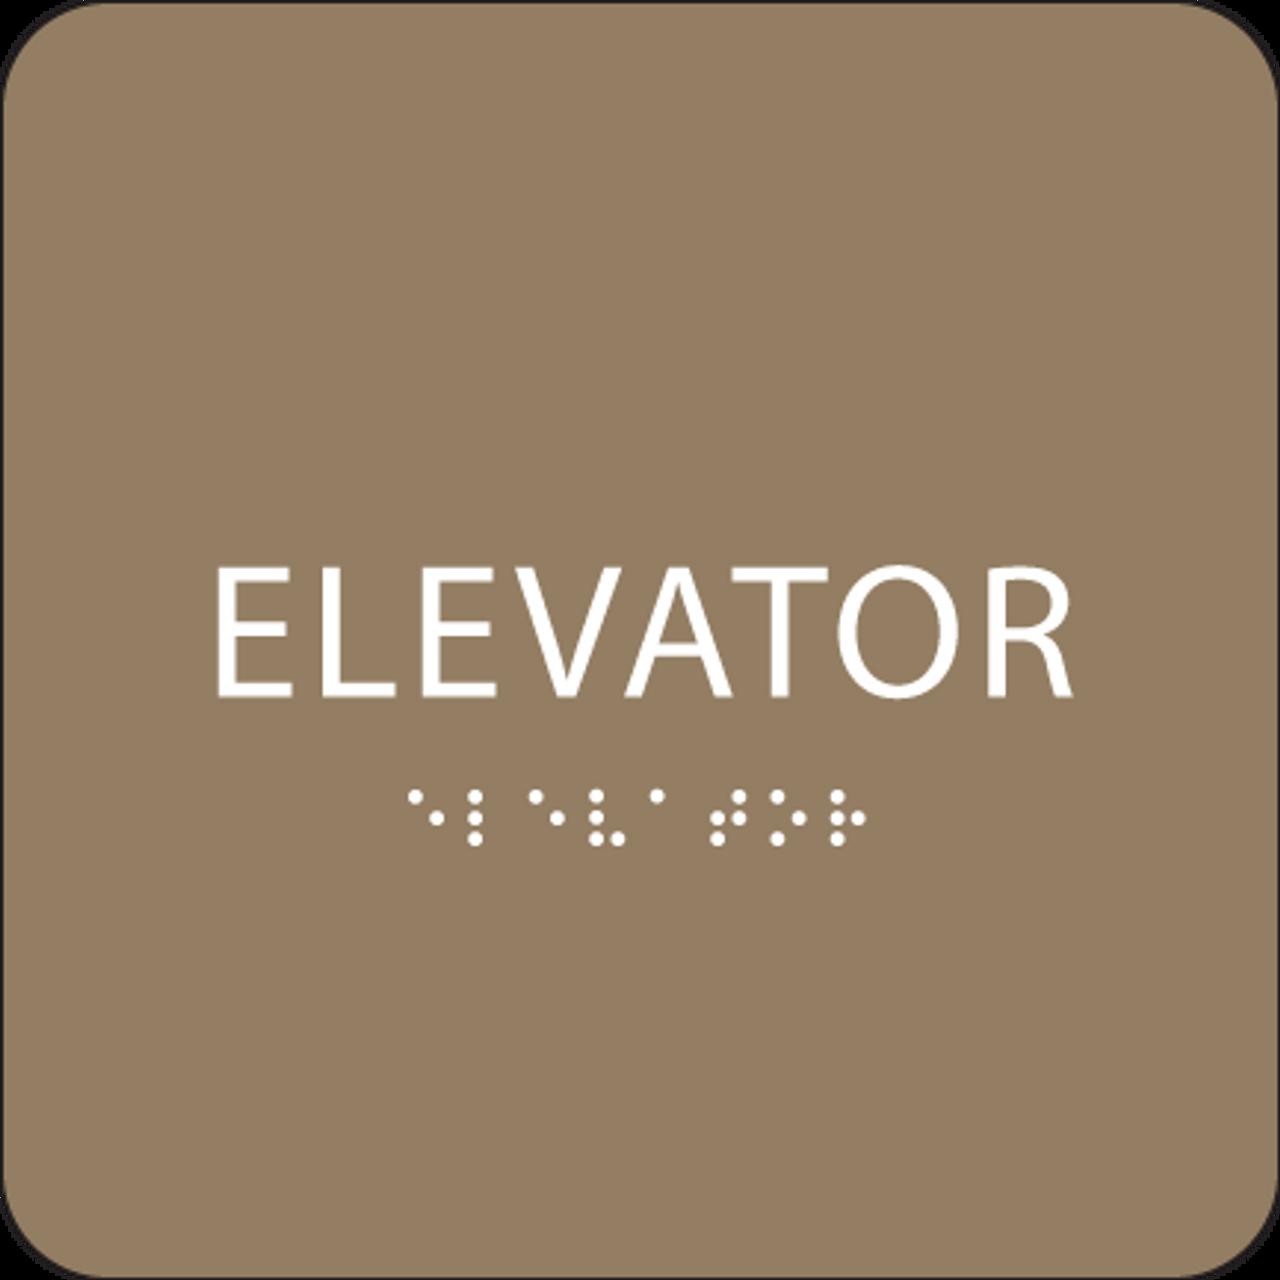 Brown ADA Elevator Sign